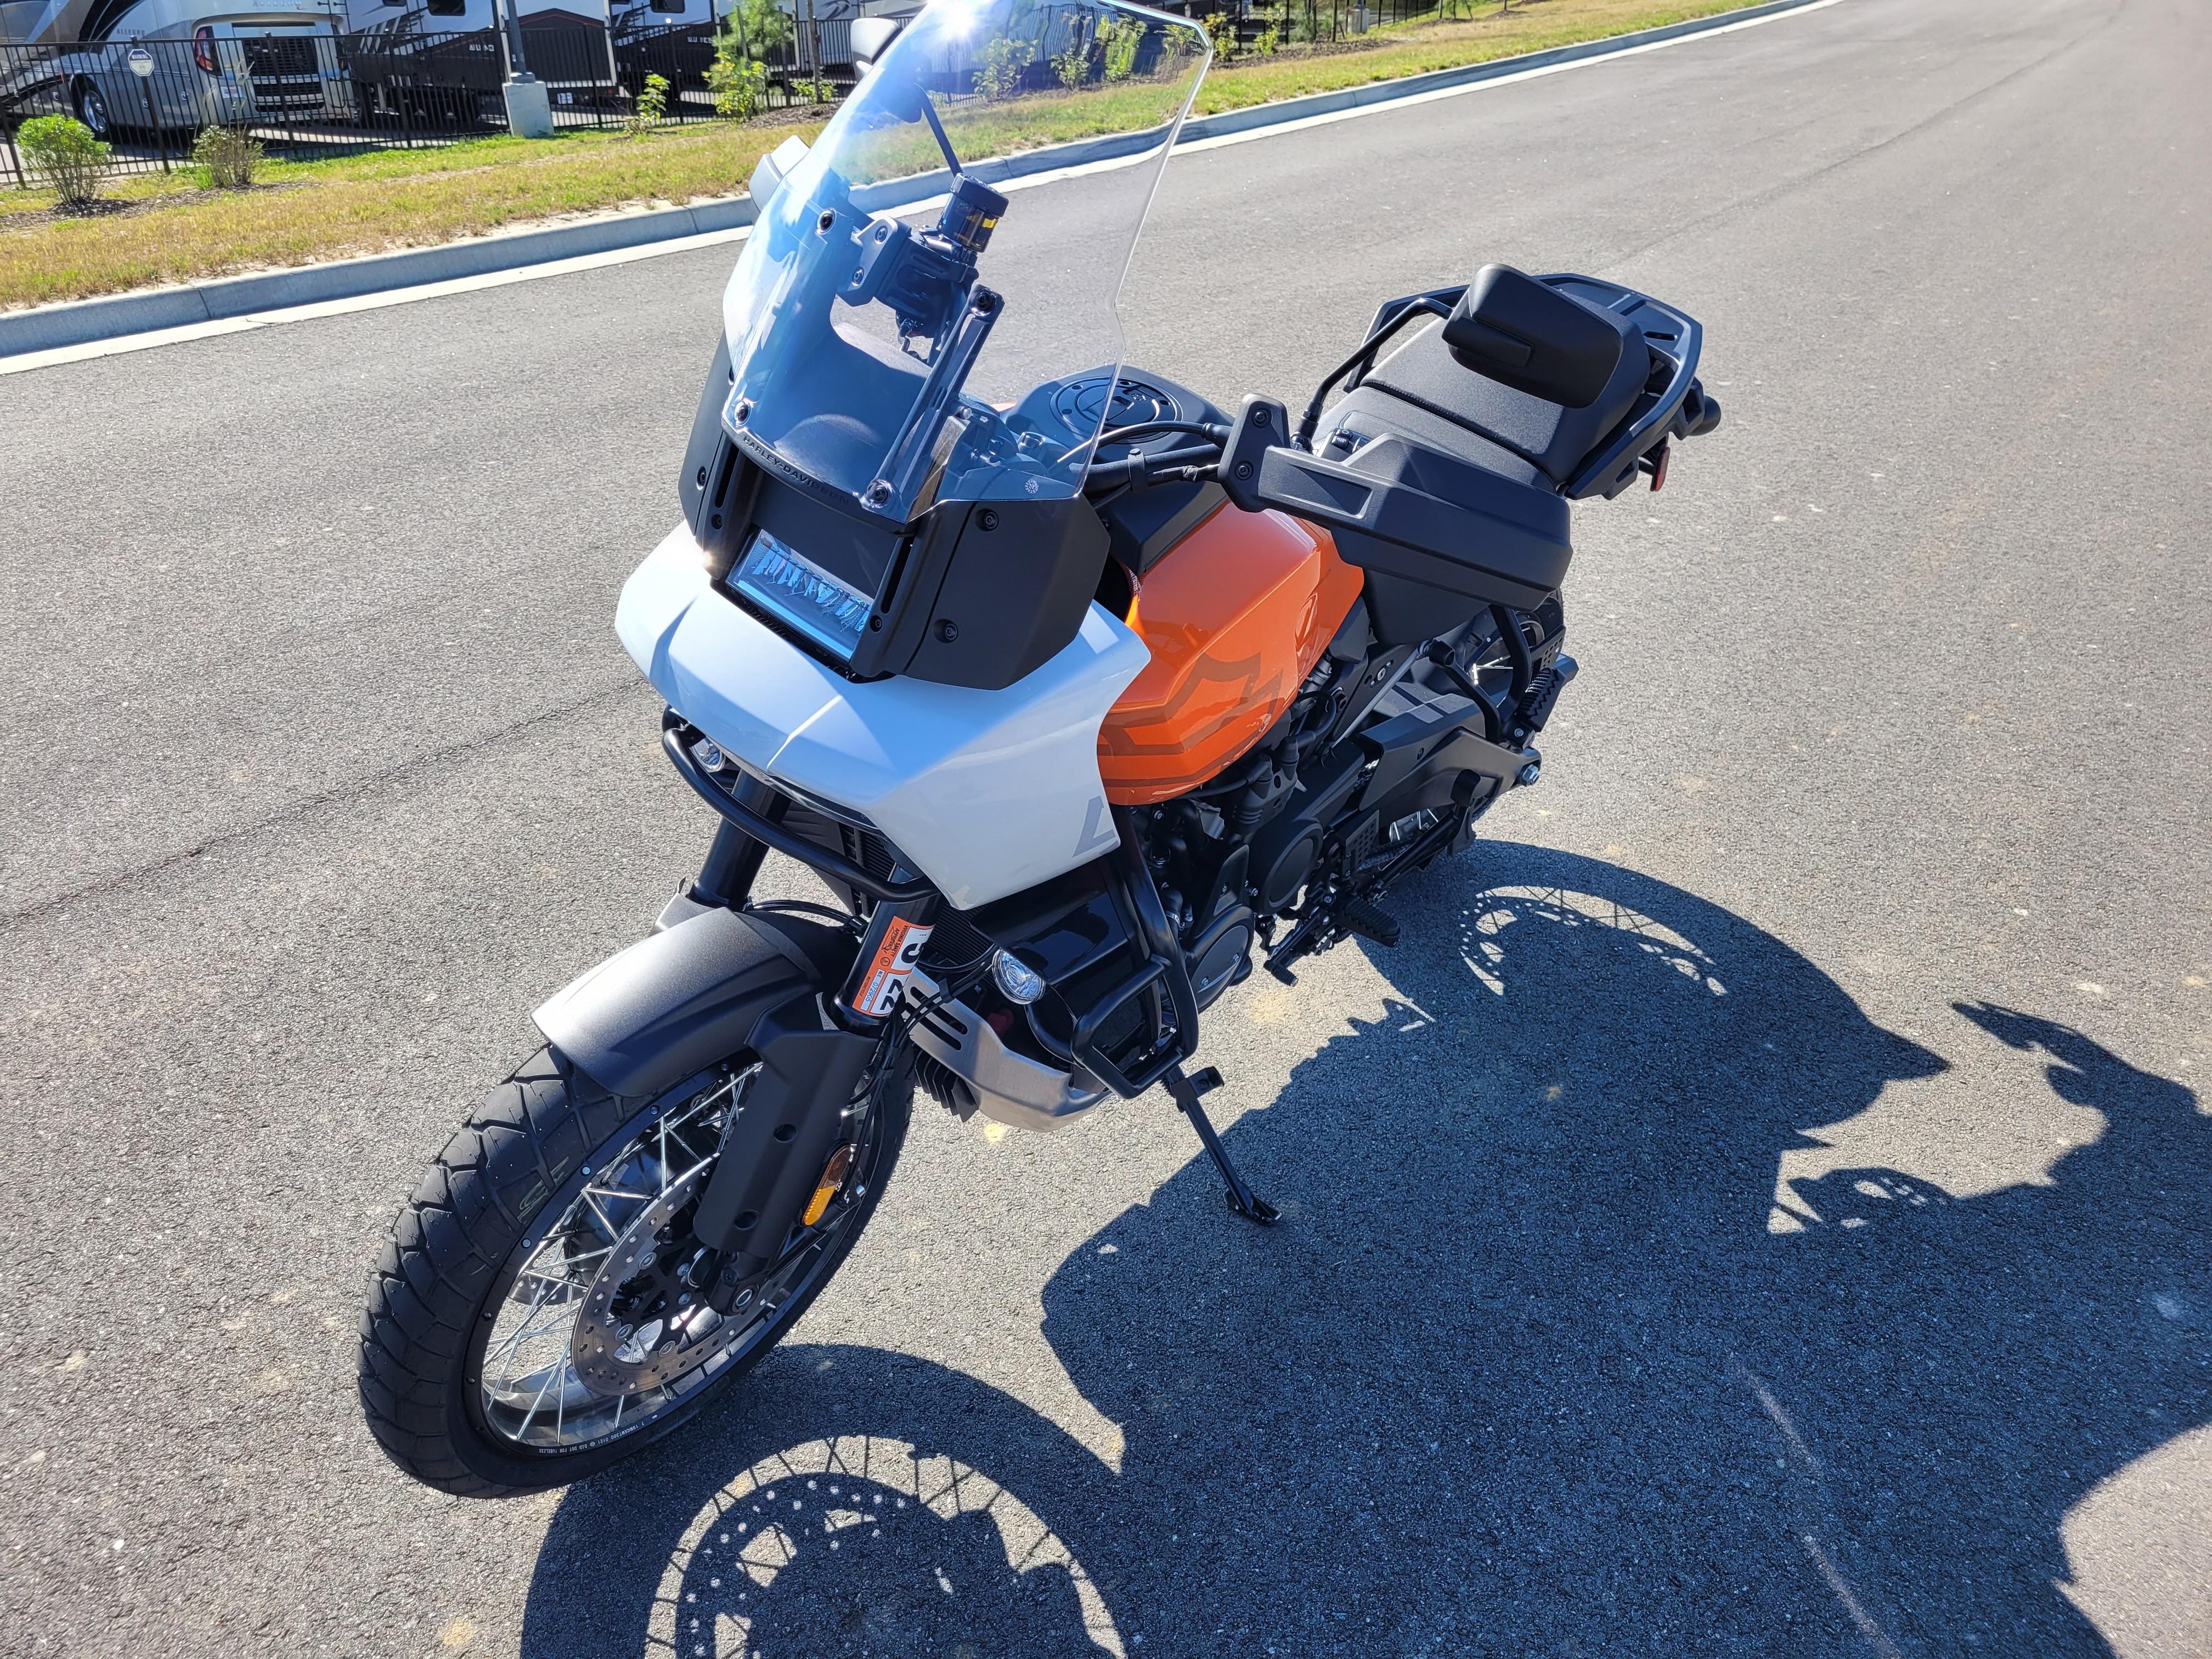 2021 Harley-Davidson Pan America Pan America 1250 Special at Richmond Harley-Davidson